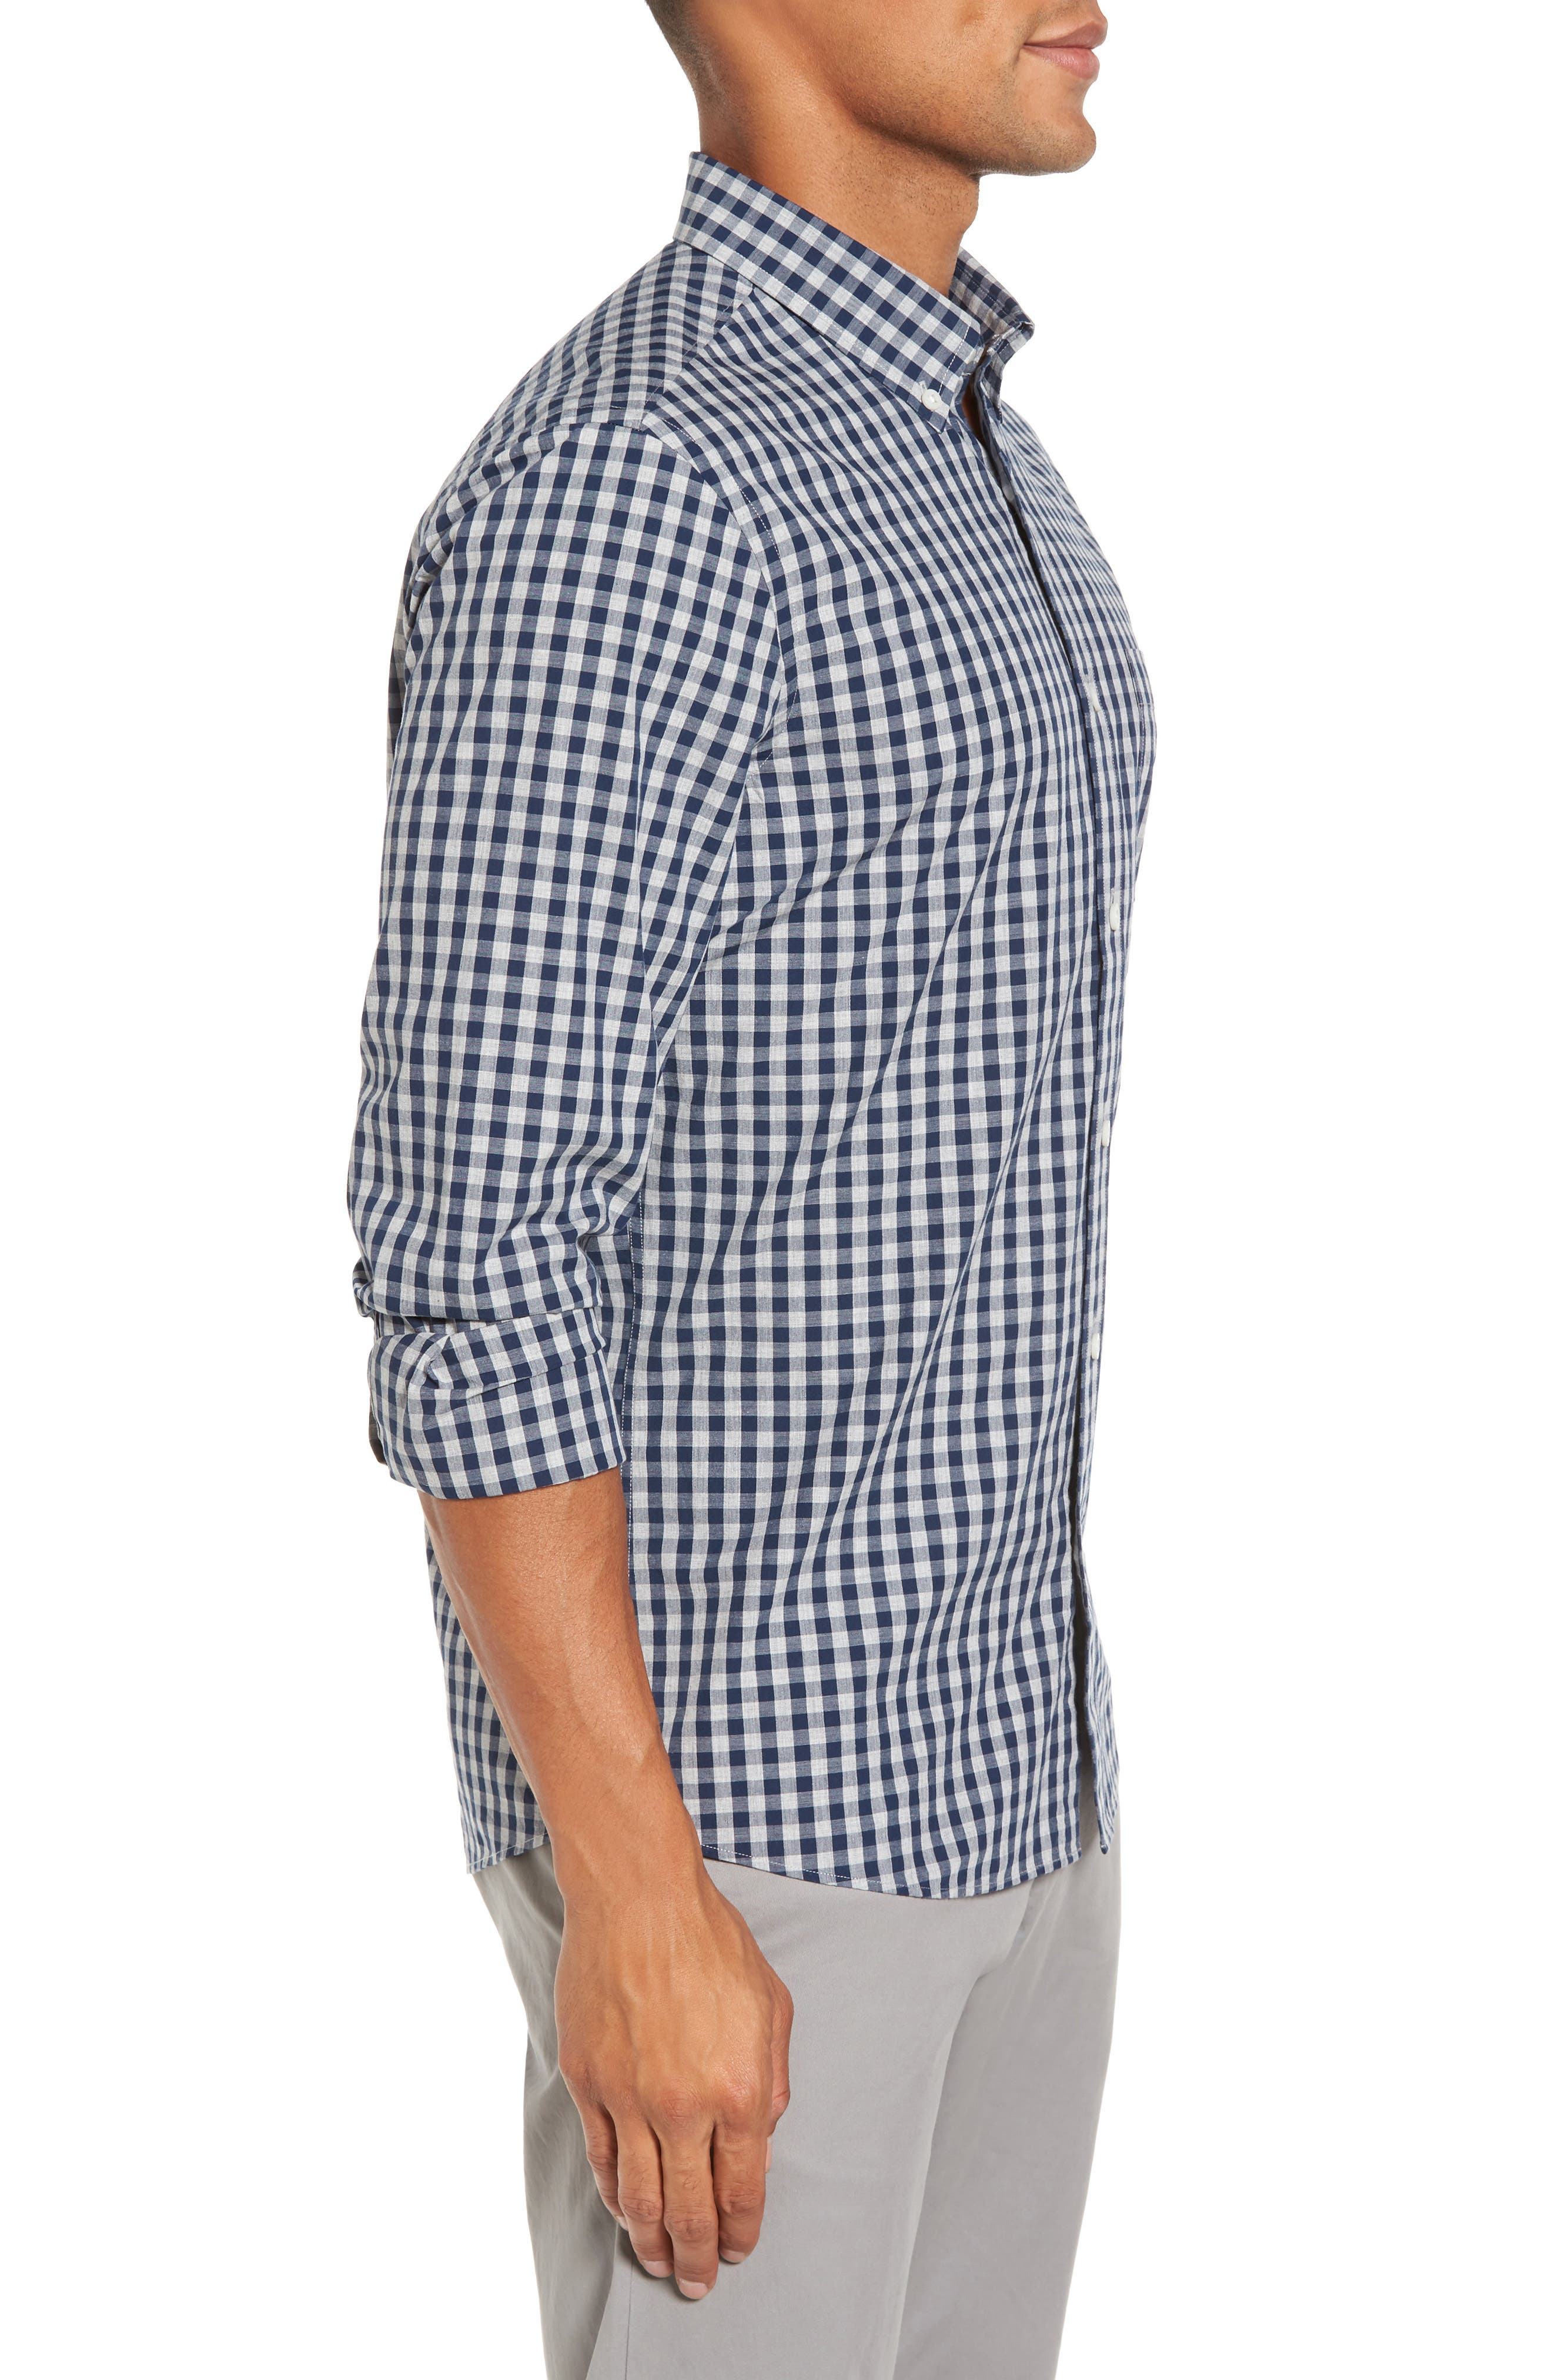 Spade Trim Fit Gingham Check Sport Shirt,                             Alternate thumbnail 4, color,                             Grey Shade Navy Gingham